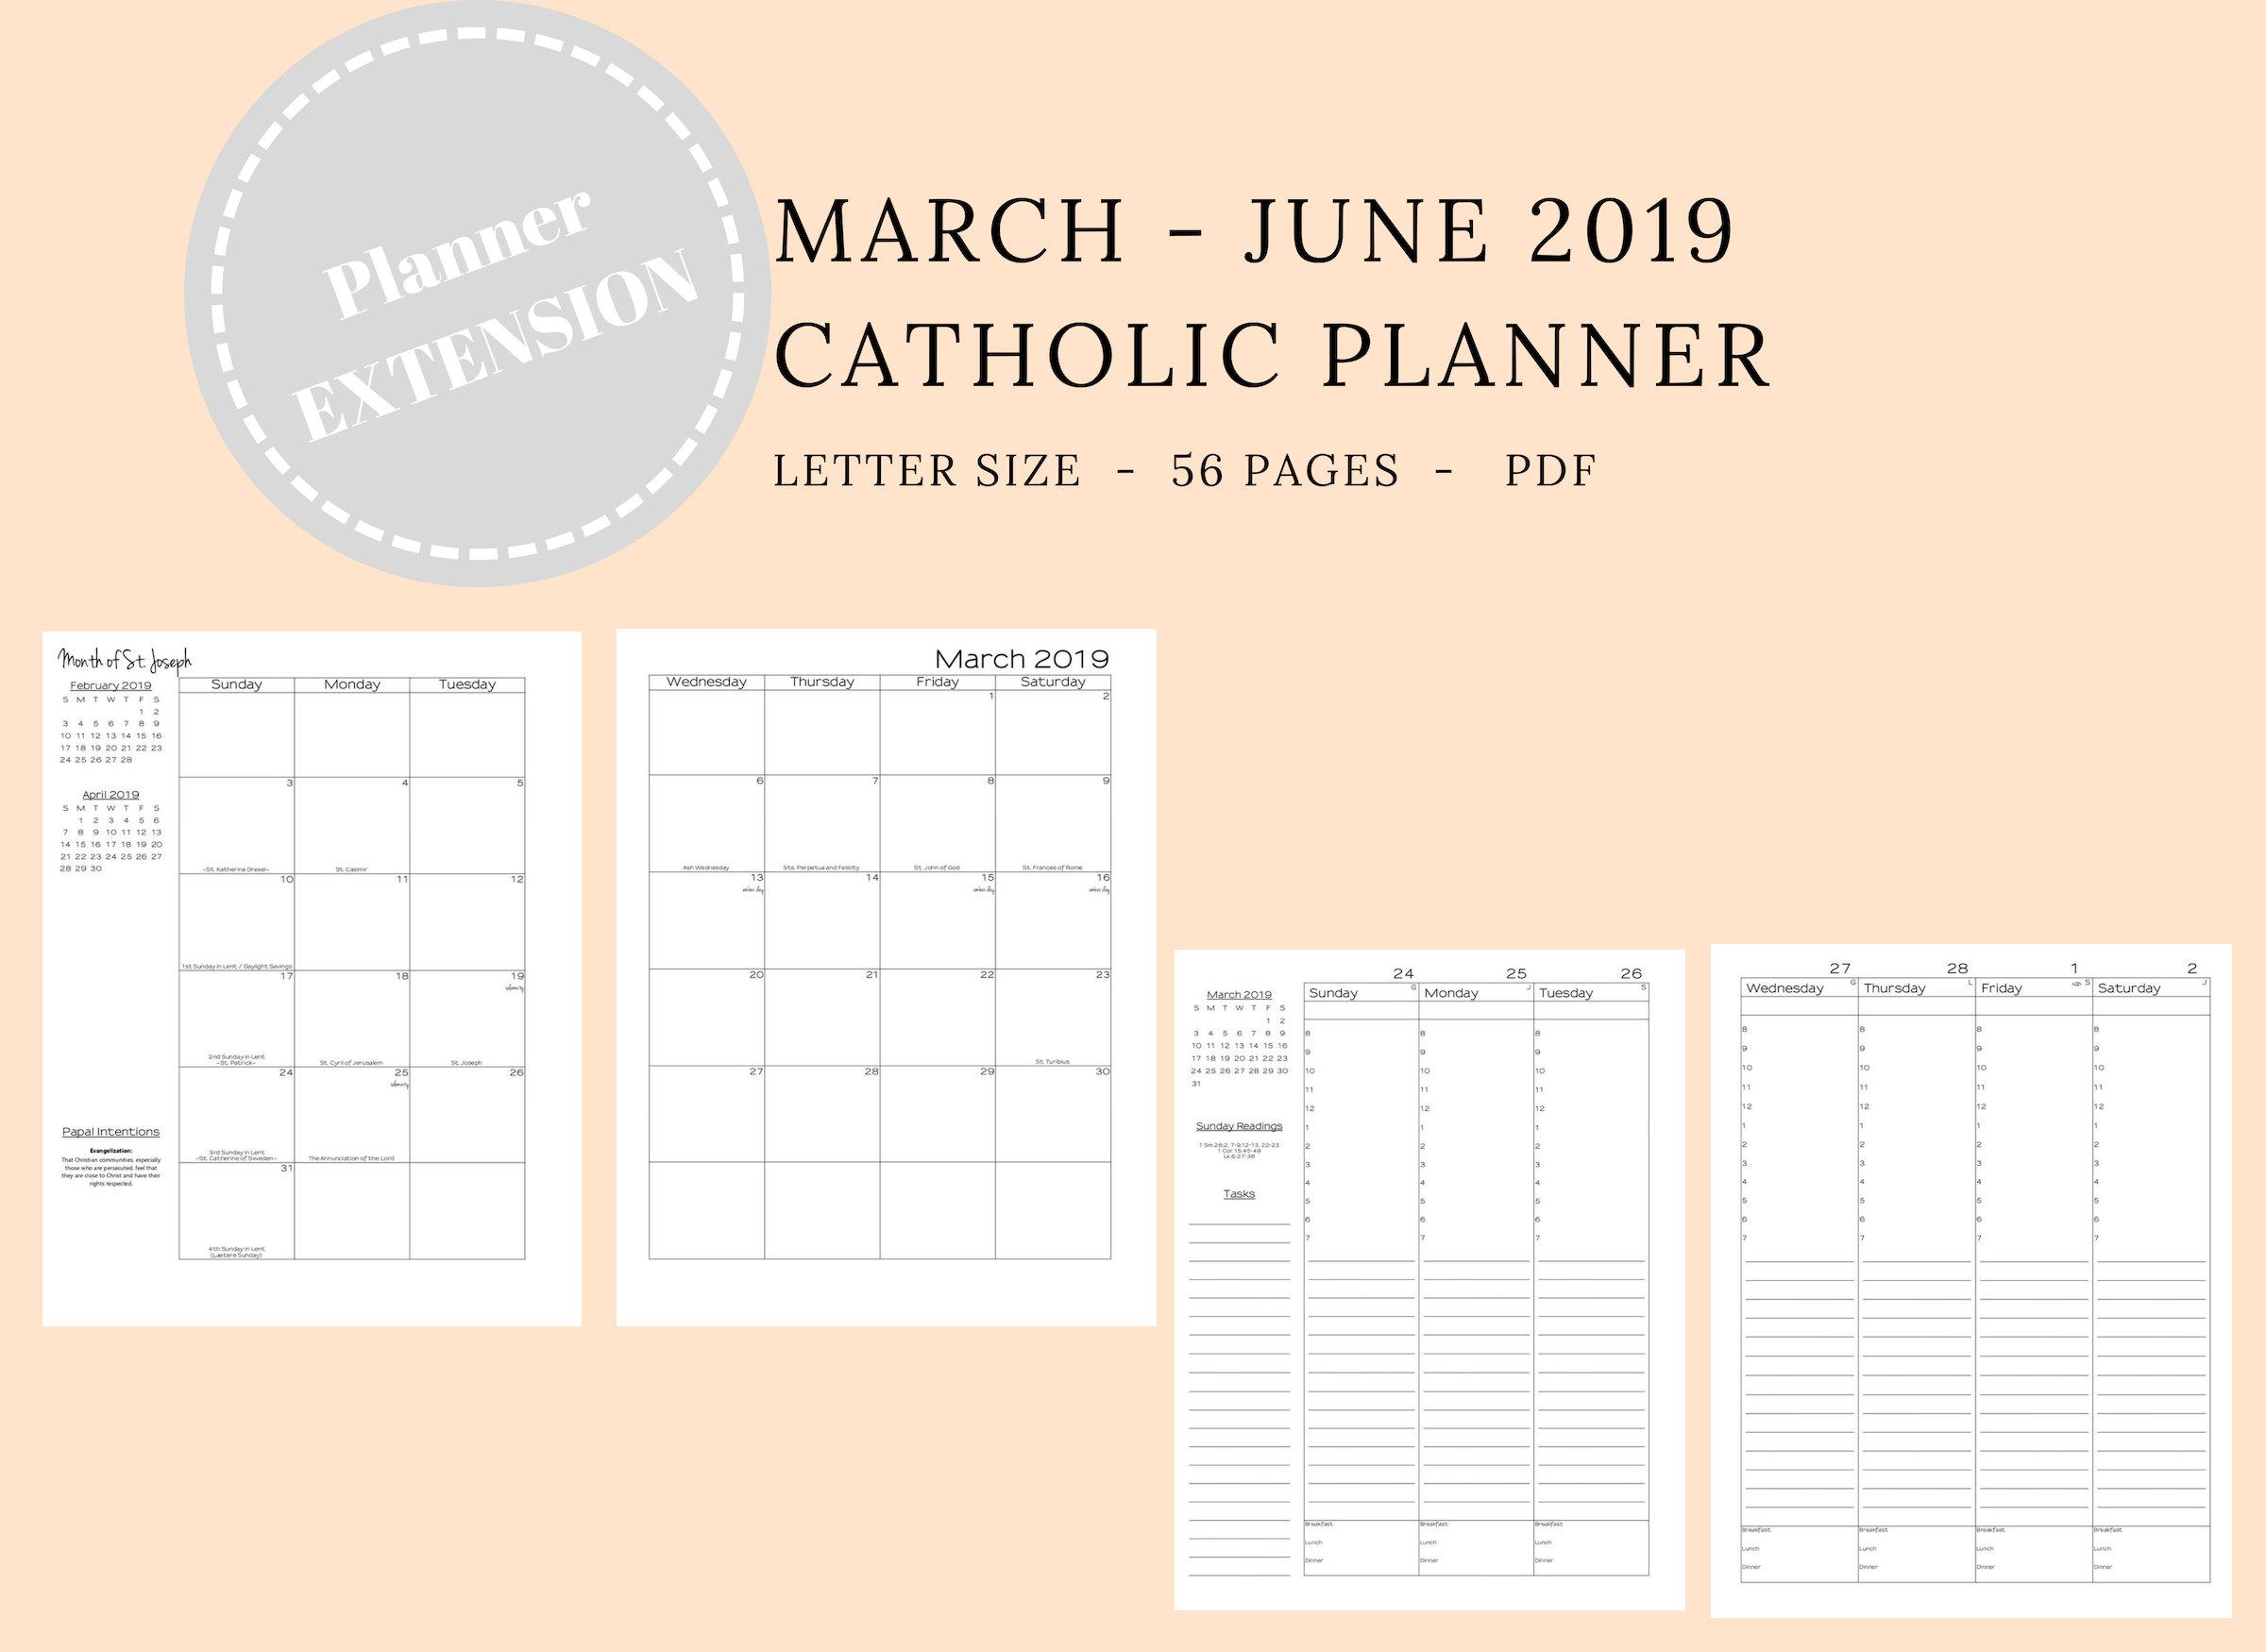 2019 Catholic Planner *extension* Weekly Printable: Daily Planner  Weekly  Calendar  Liturgical Planner  Printable Catholic Planner within Catholic Extension Calendar